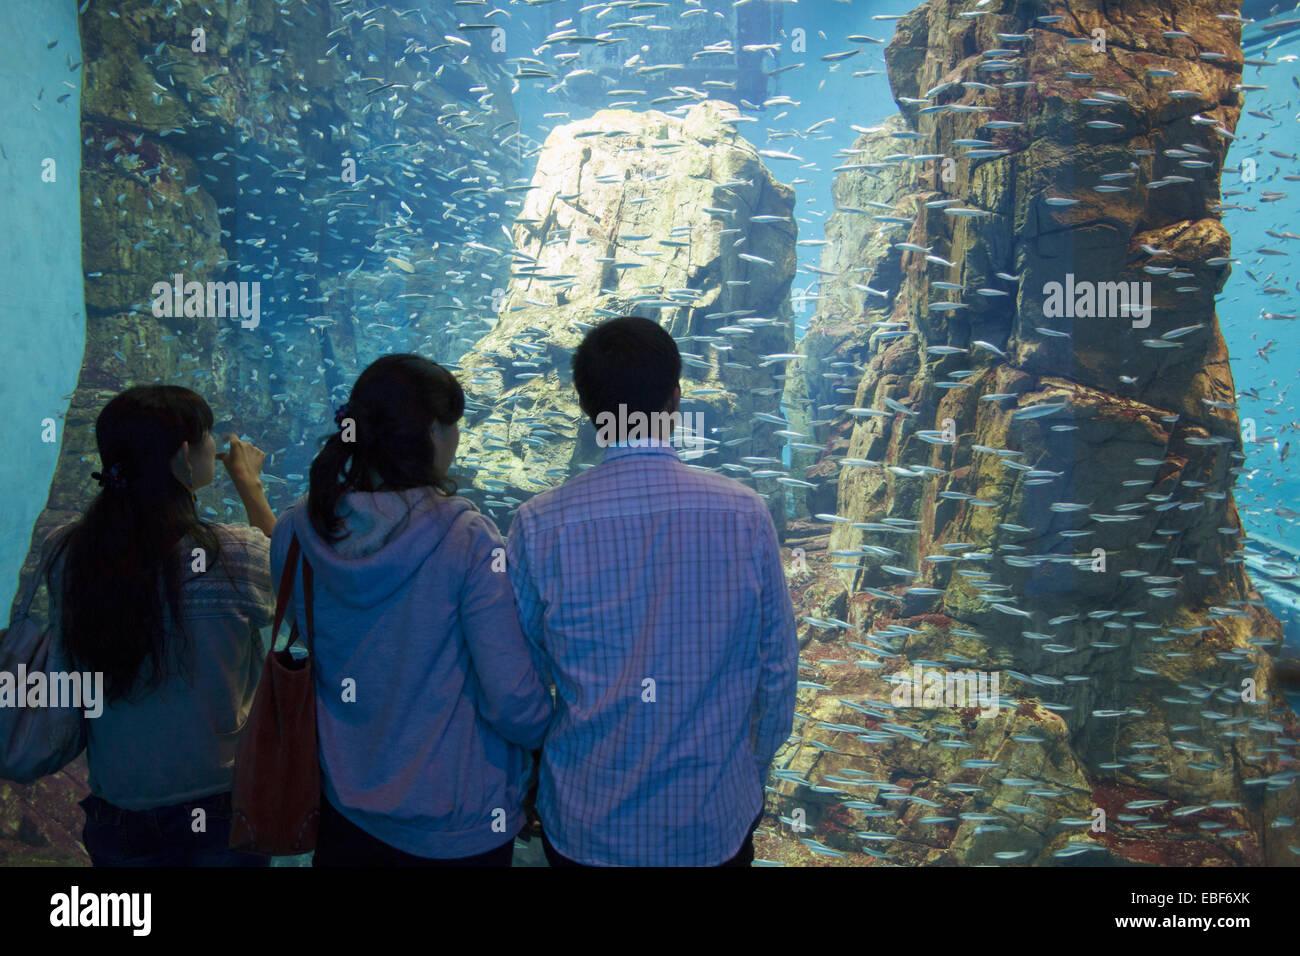 Fish aquarium japan - People Watching Fish At Osaka Aquarium Tempozan Osaka Kansai Japan